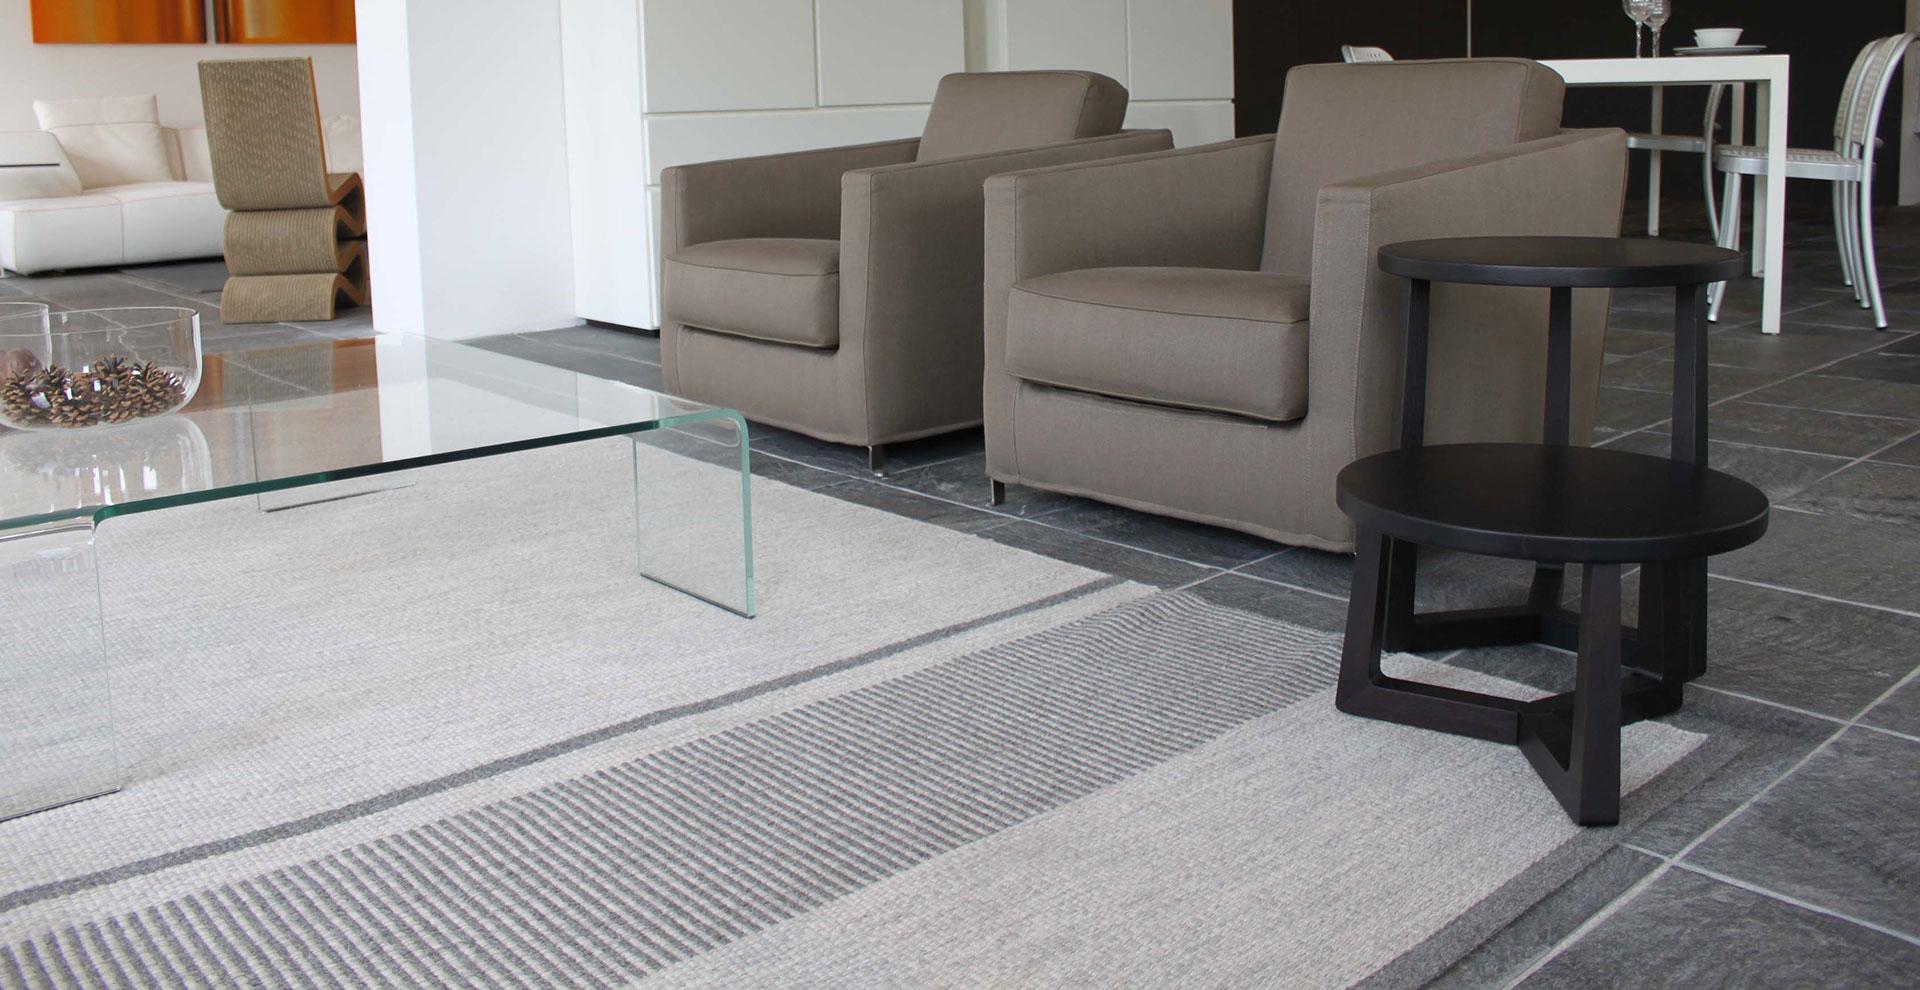 Hagga kasthall carpet hagga kasthall for Designbest outlet